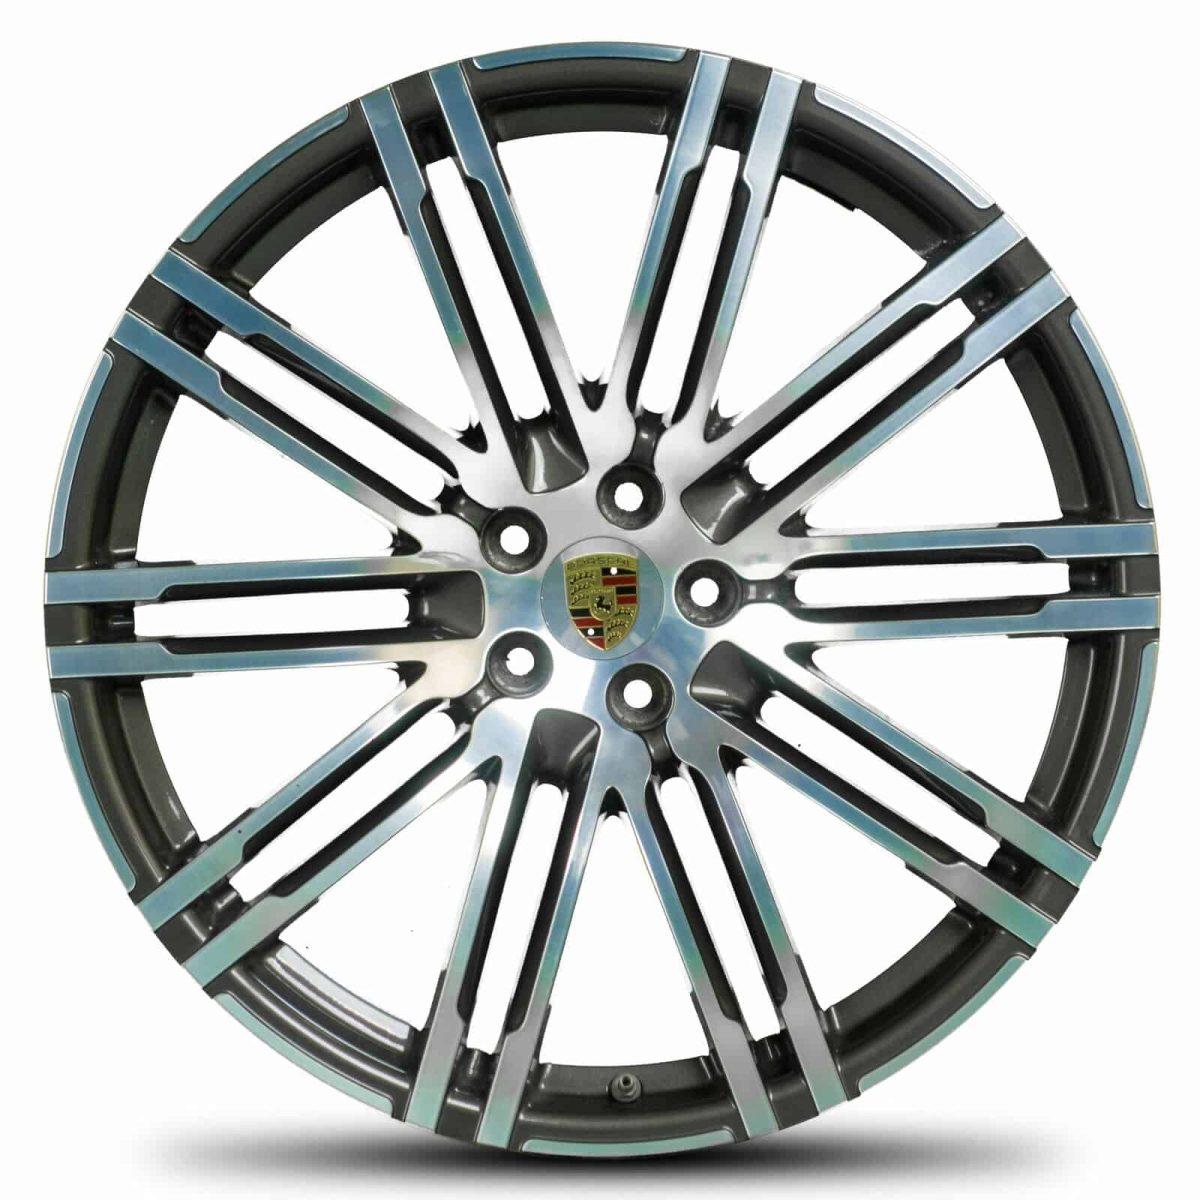 "Genuine Porsche Macan 95B Turbo Design 21"" inch Alloy Wheels with Gloss Black & Diamond Turned Finish 95B601025AT041 95B601025BA041"